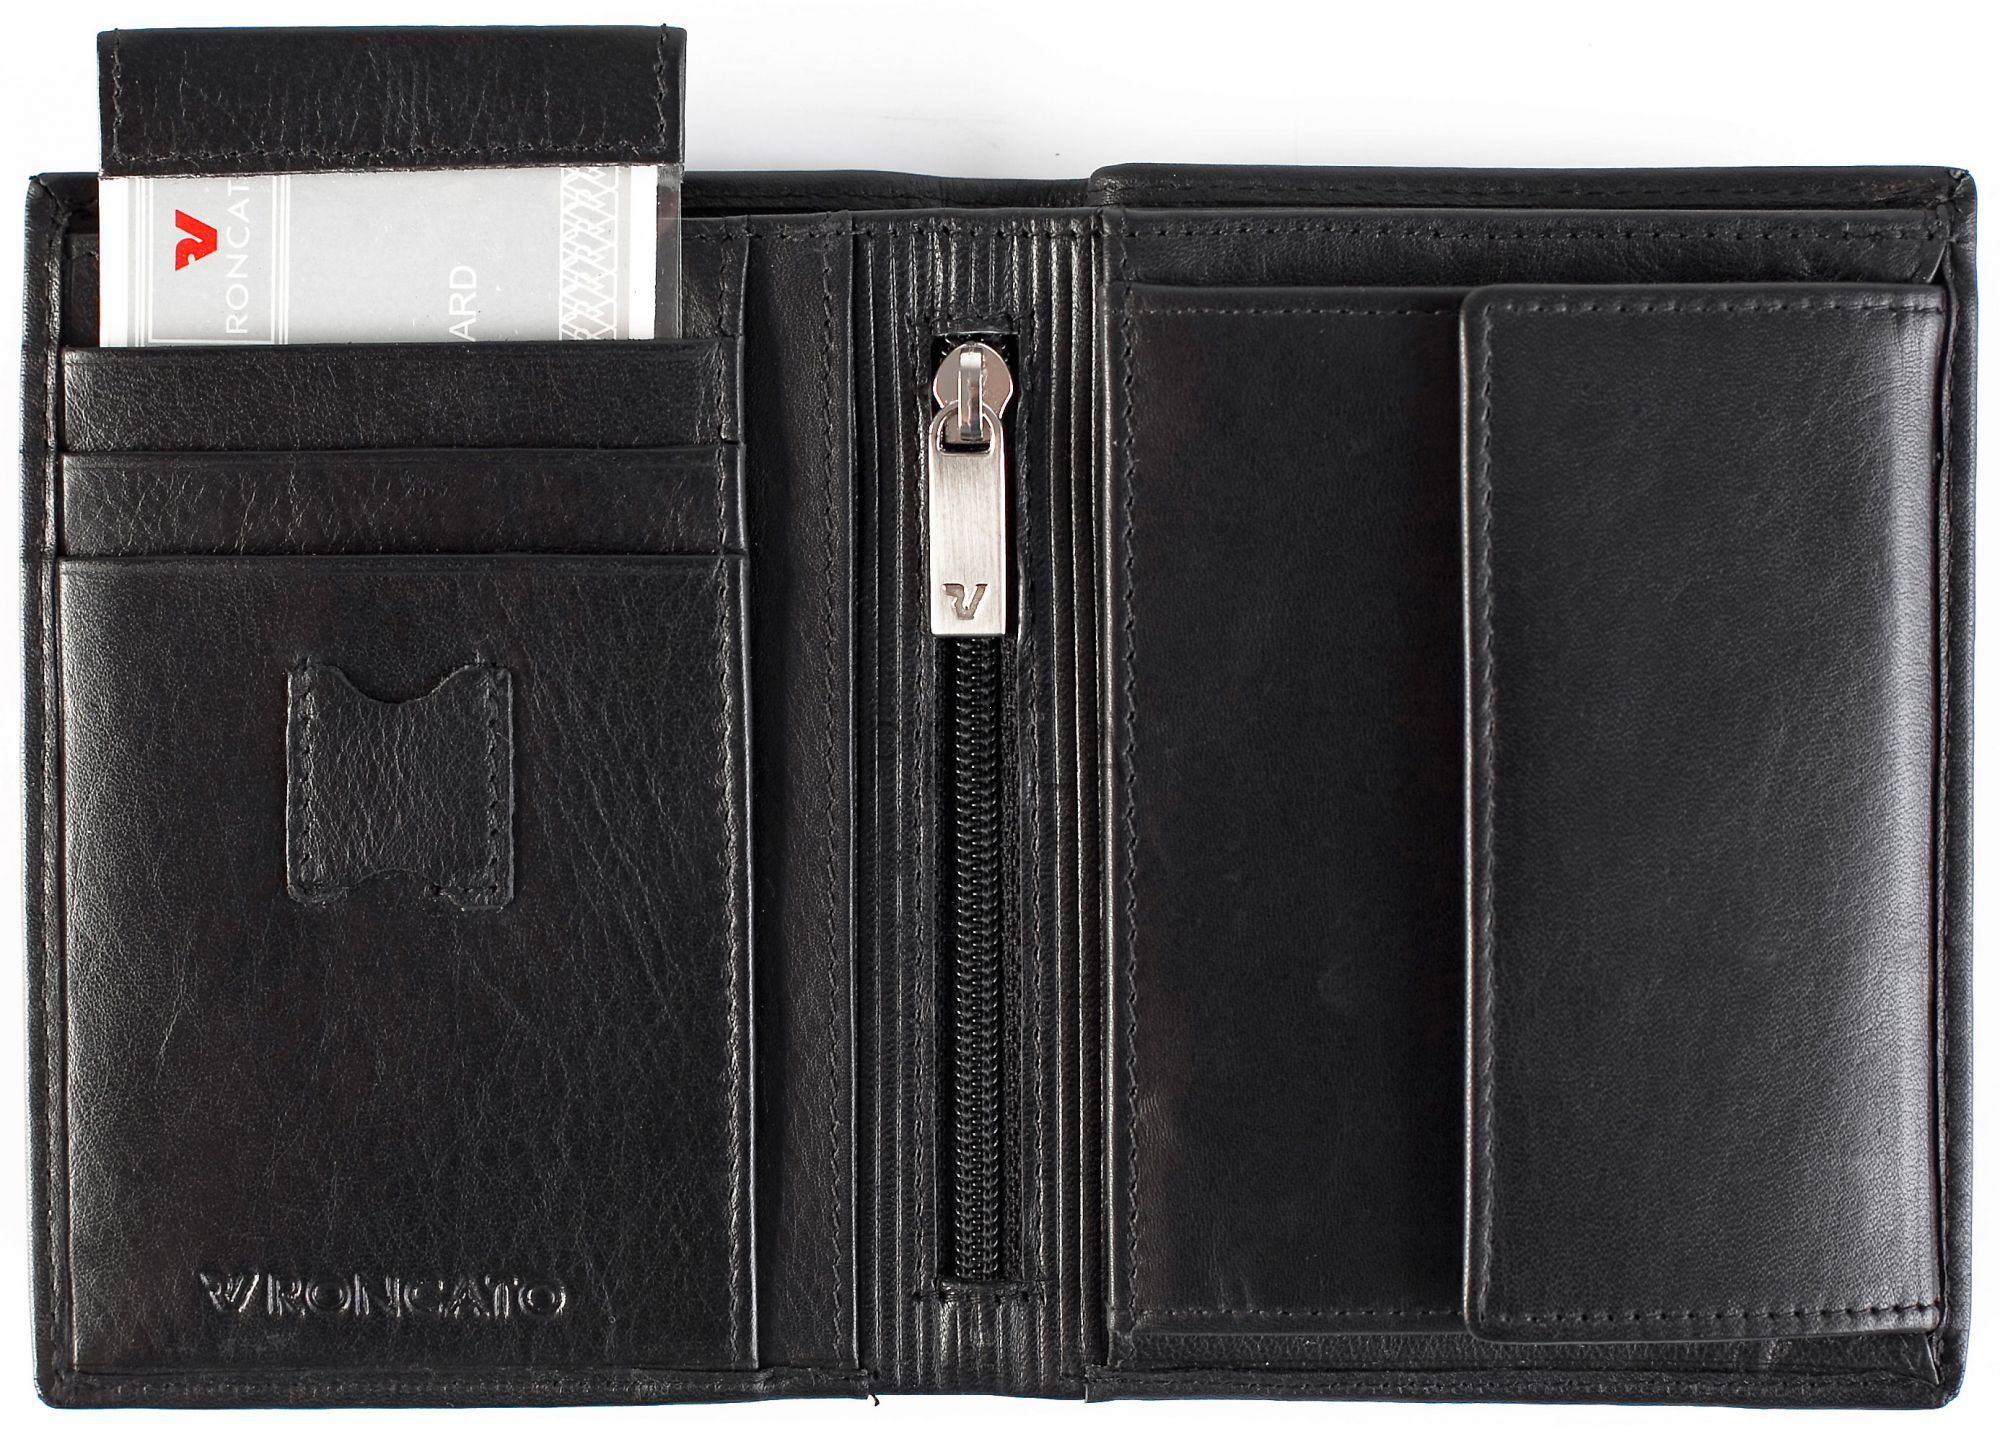 fcd6f673c6f23 Portfel męski skórzany marki Roncato z kolekcji Luxury - kolor ...